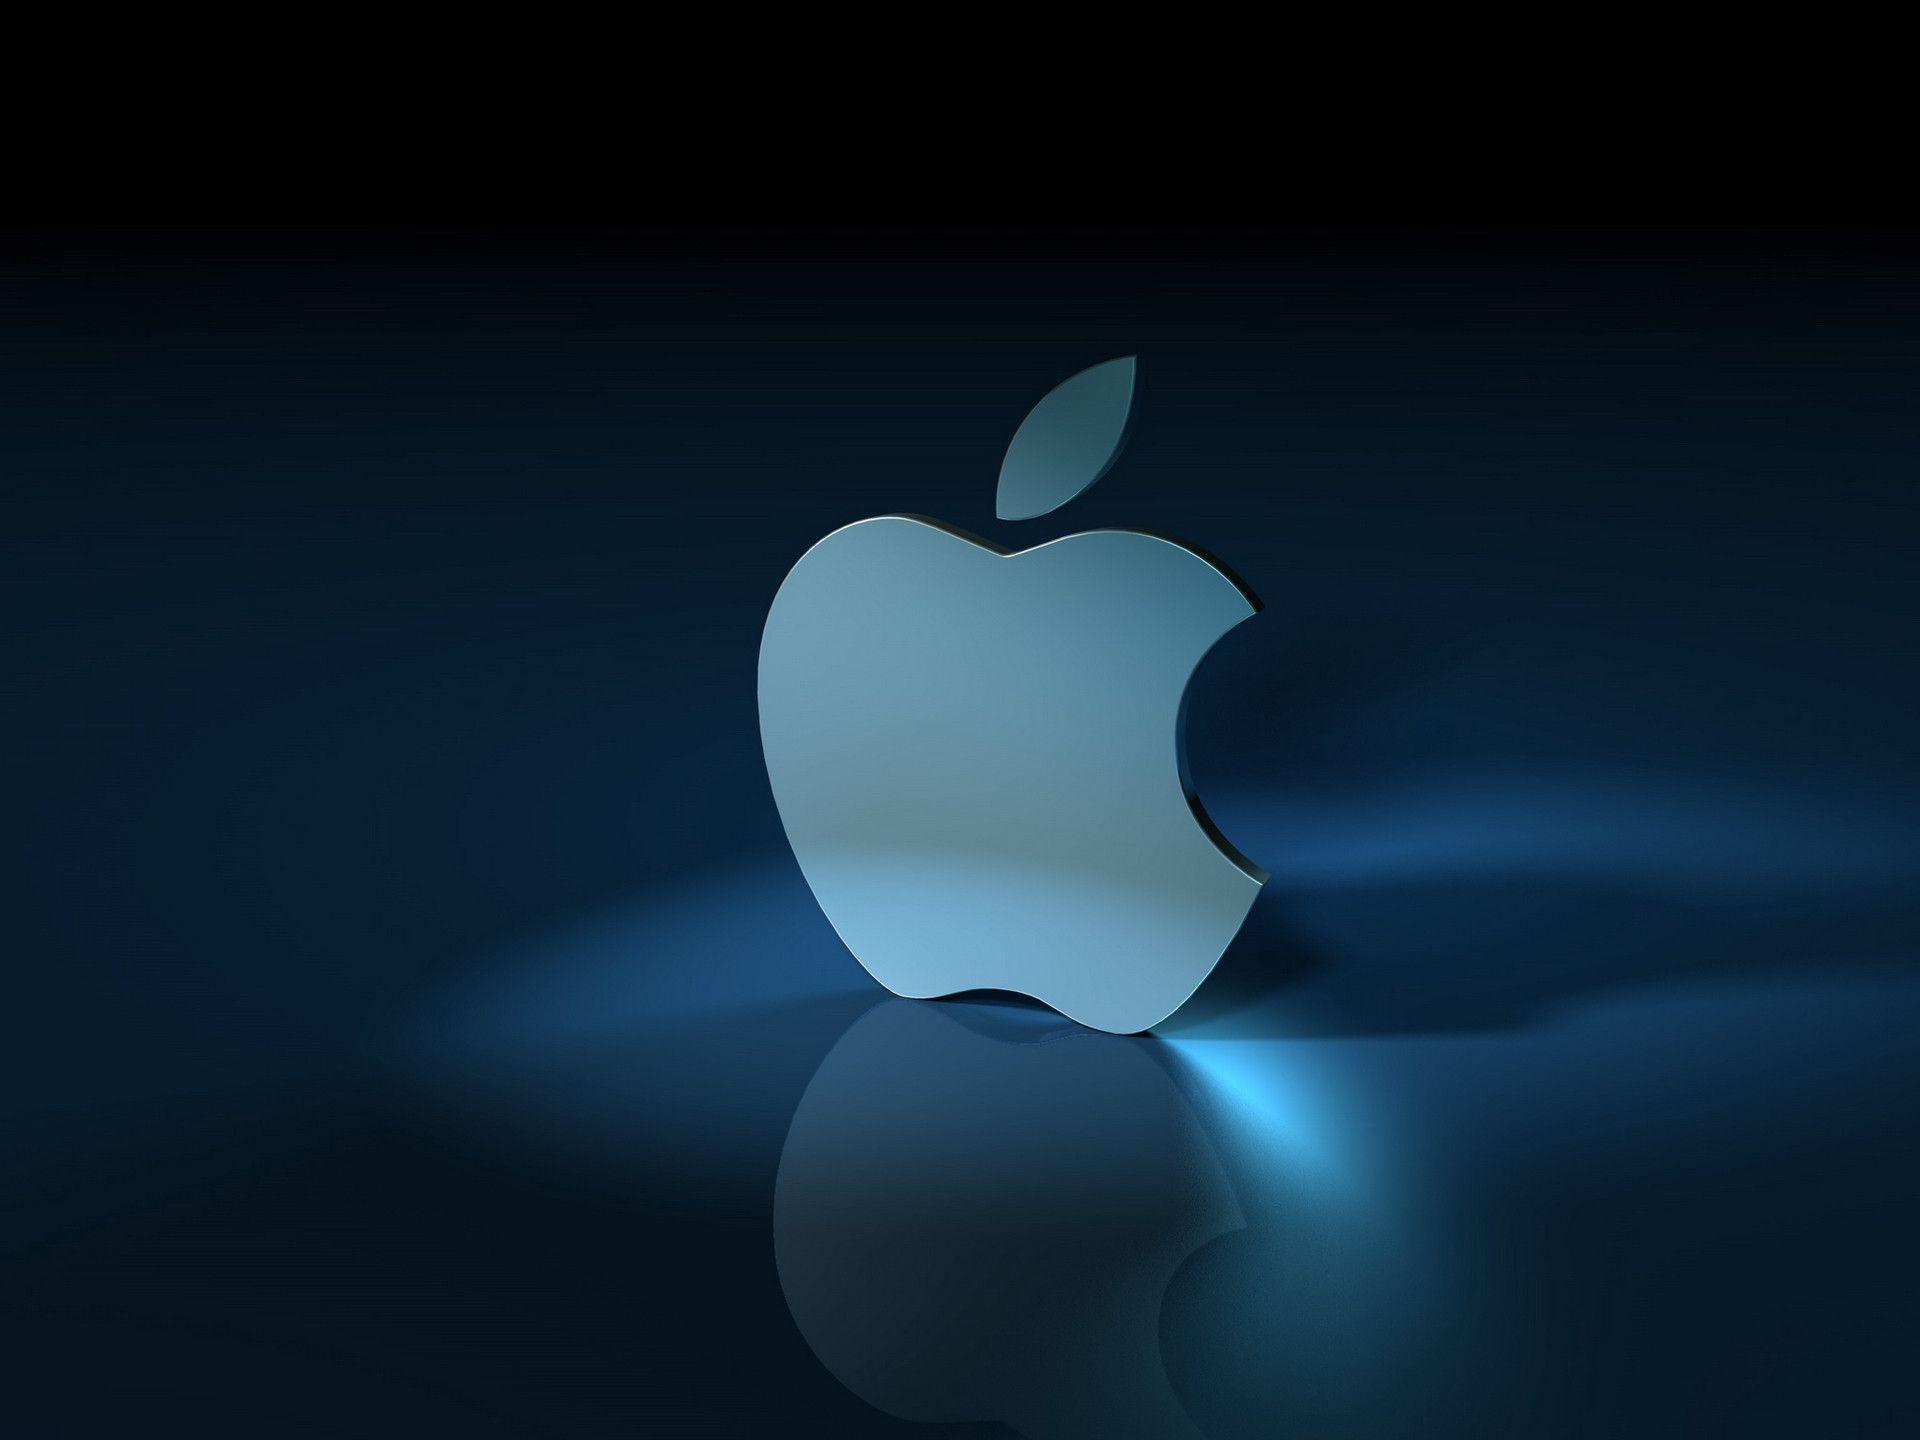 Apple 3d Wallpaper 76 Images